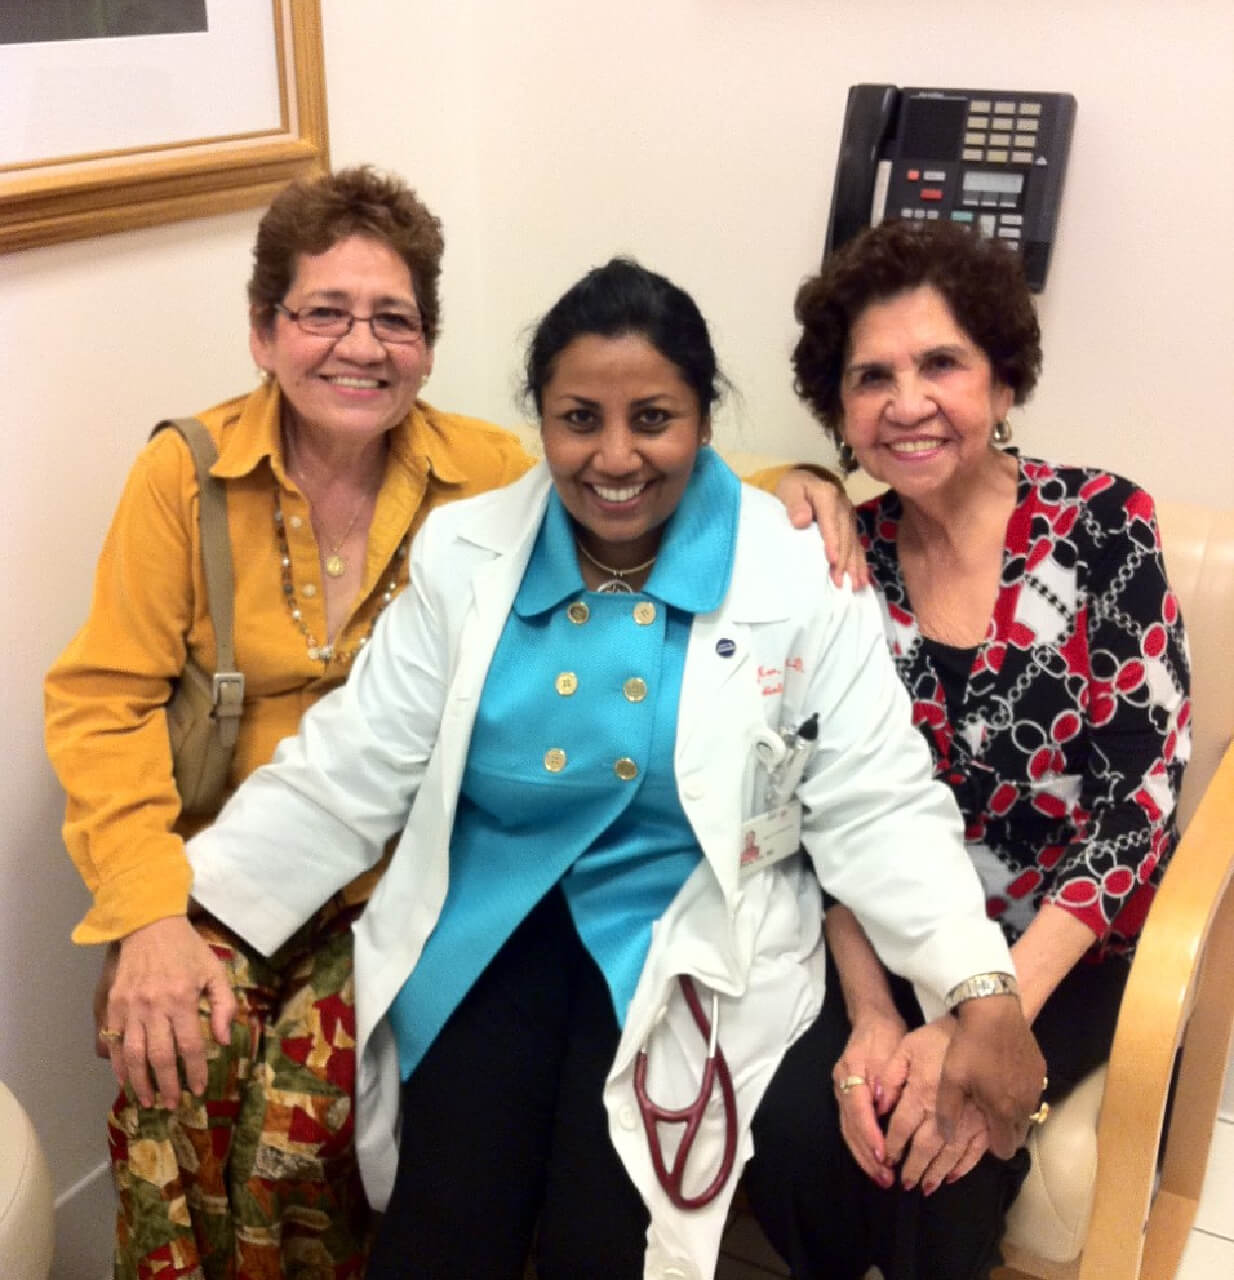 Sheila Kar with patients photo